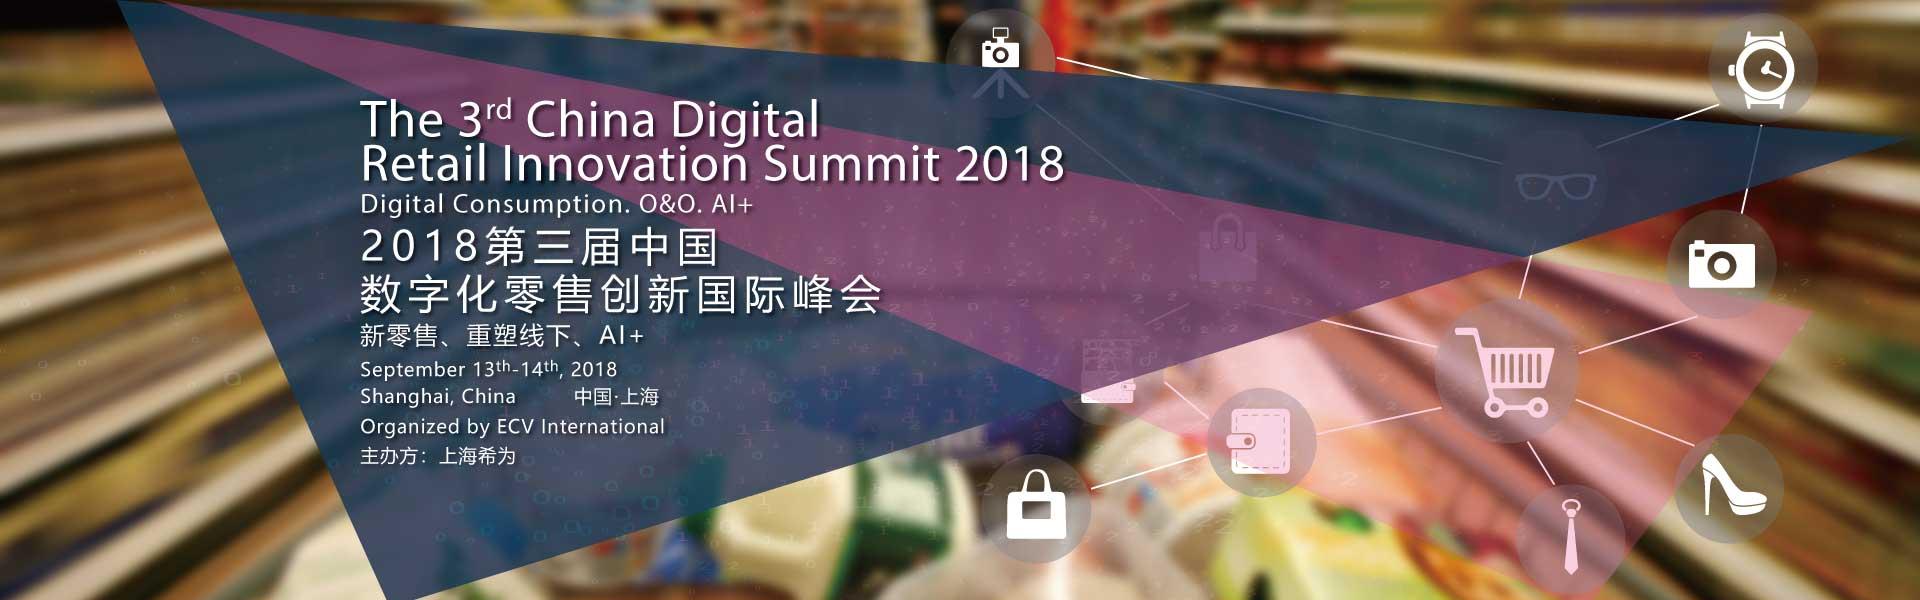 The 3rd China Digital Retail Innovation Summit 2018